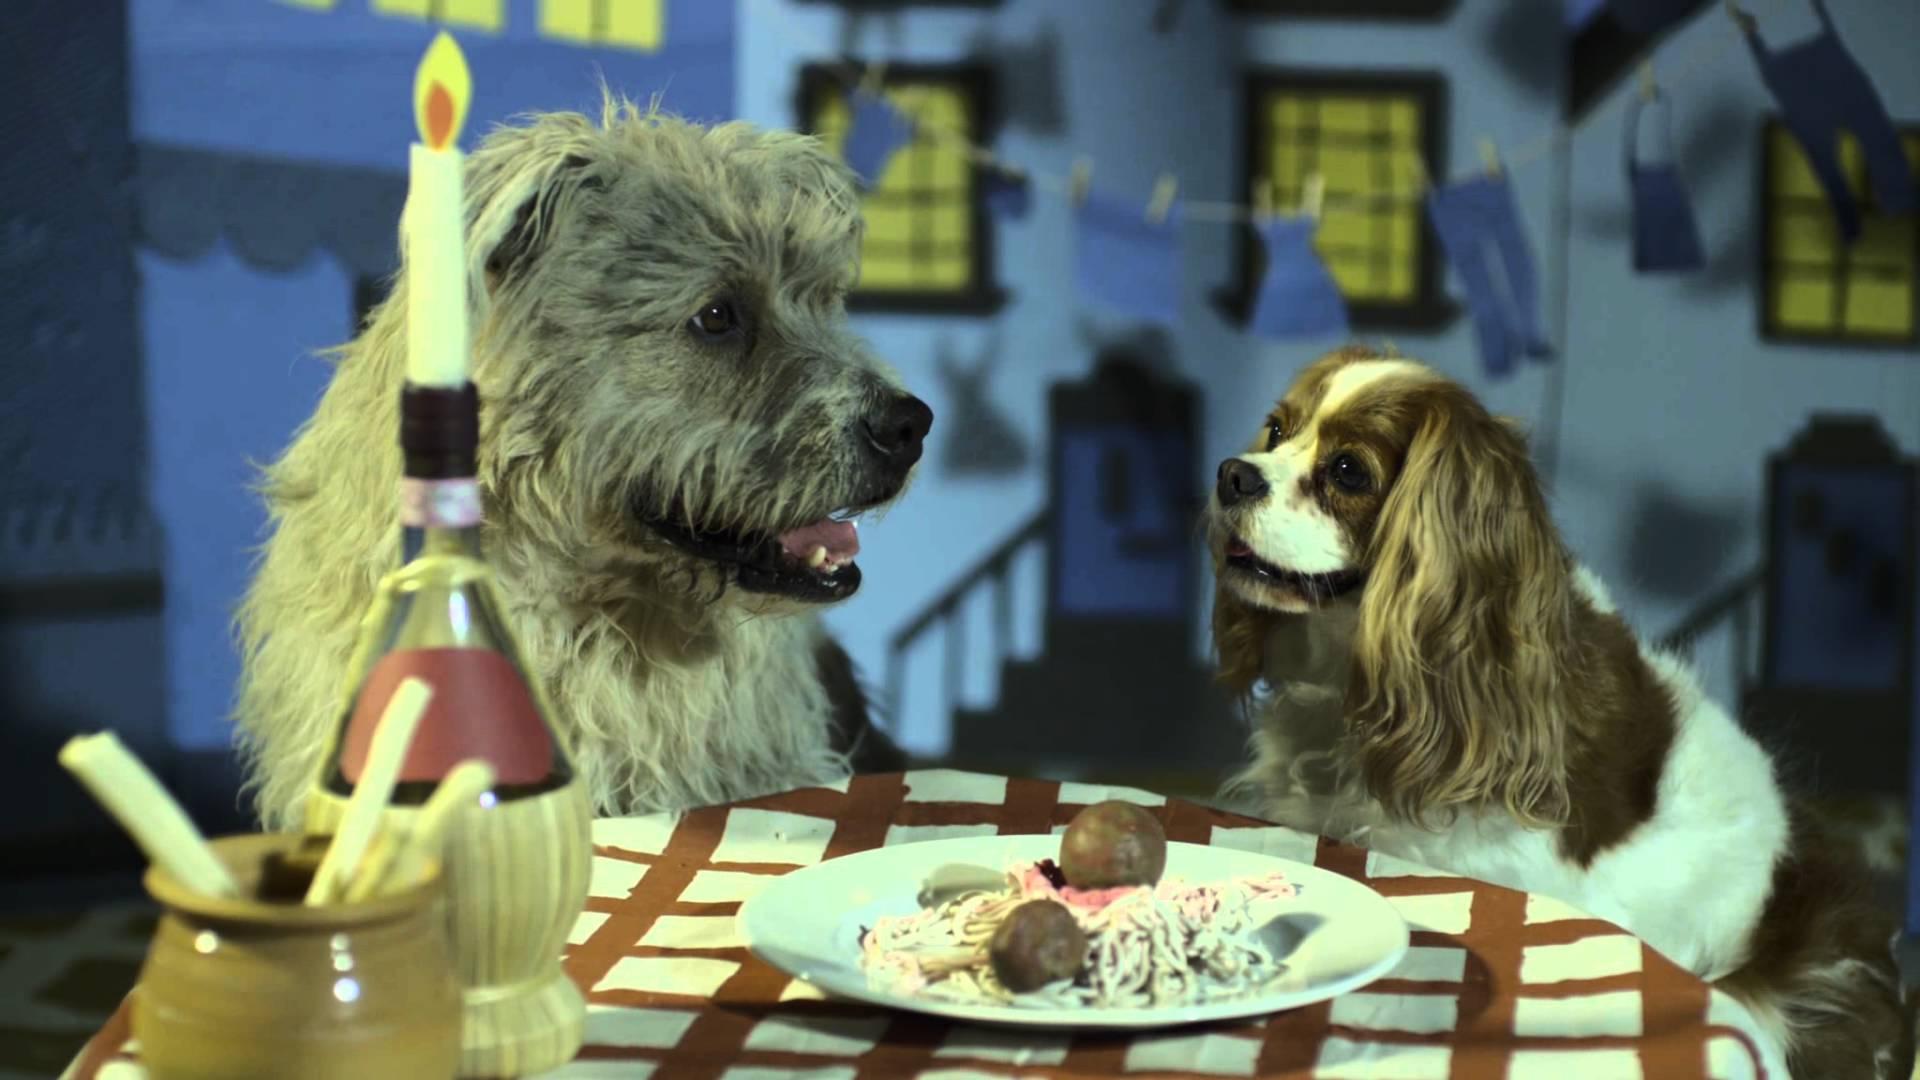 Dog Eating Spaghetti Kiss